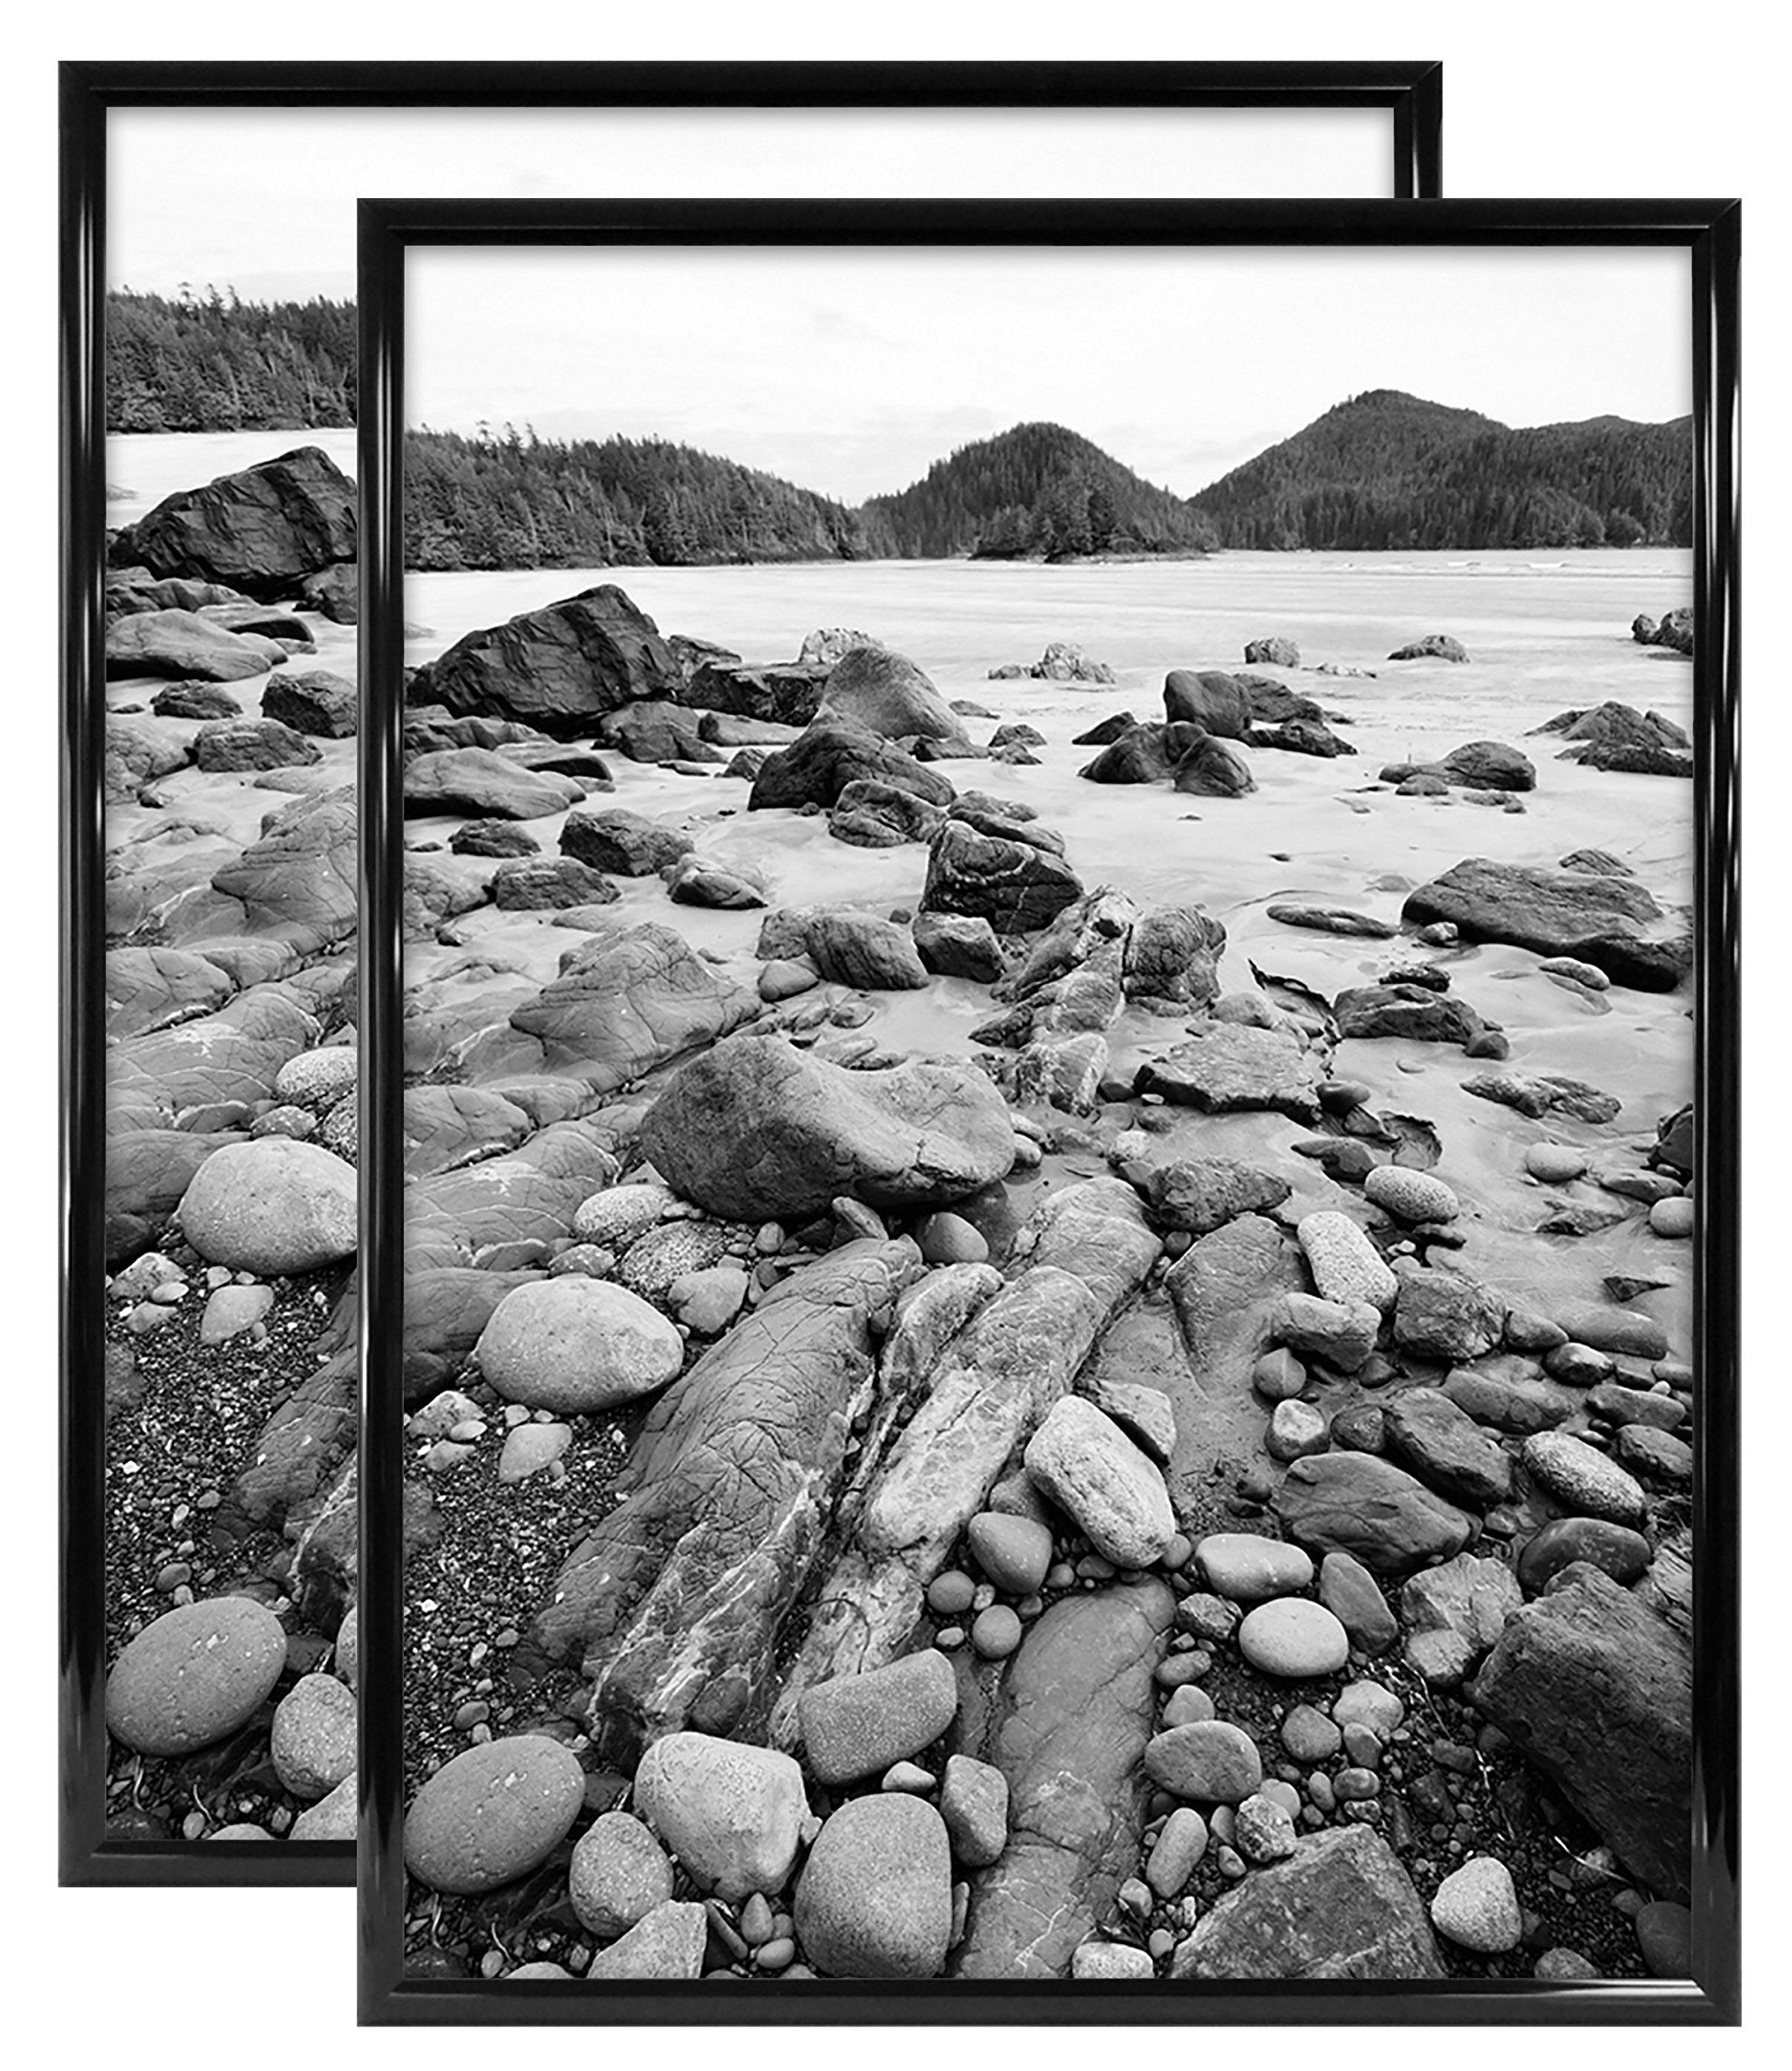 MCS Trendsetter 24x32 Inch Poster Frame (2 Pack), Black (65685) by MCS (Image #2)